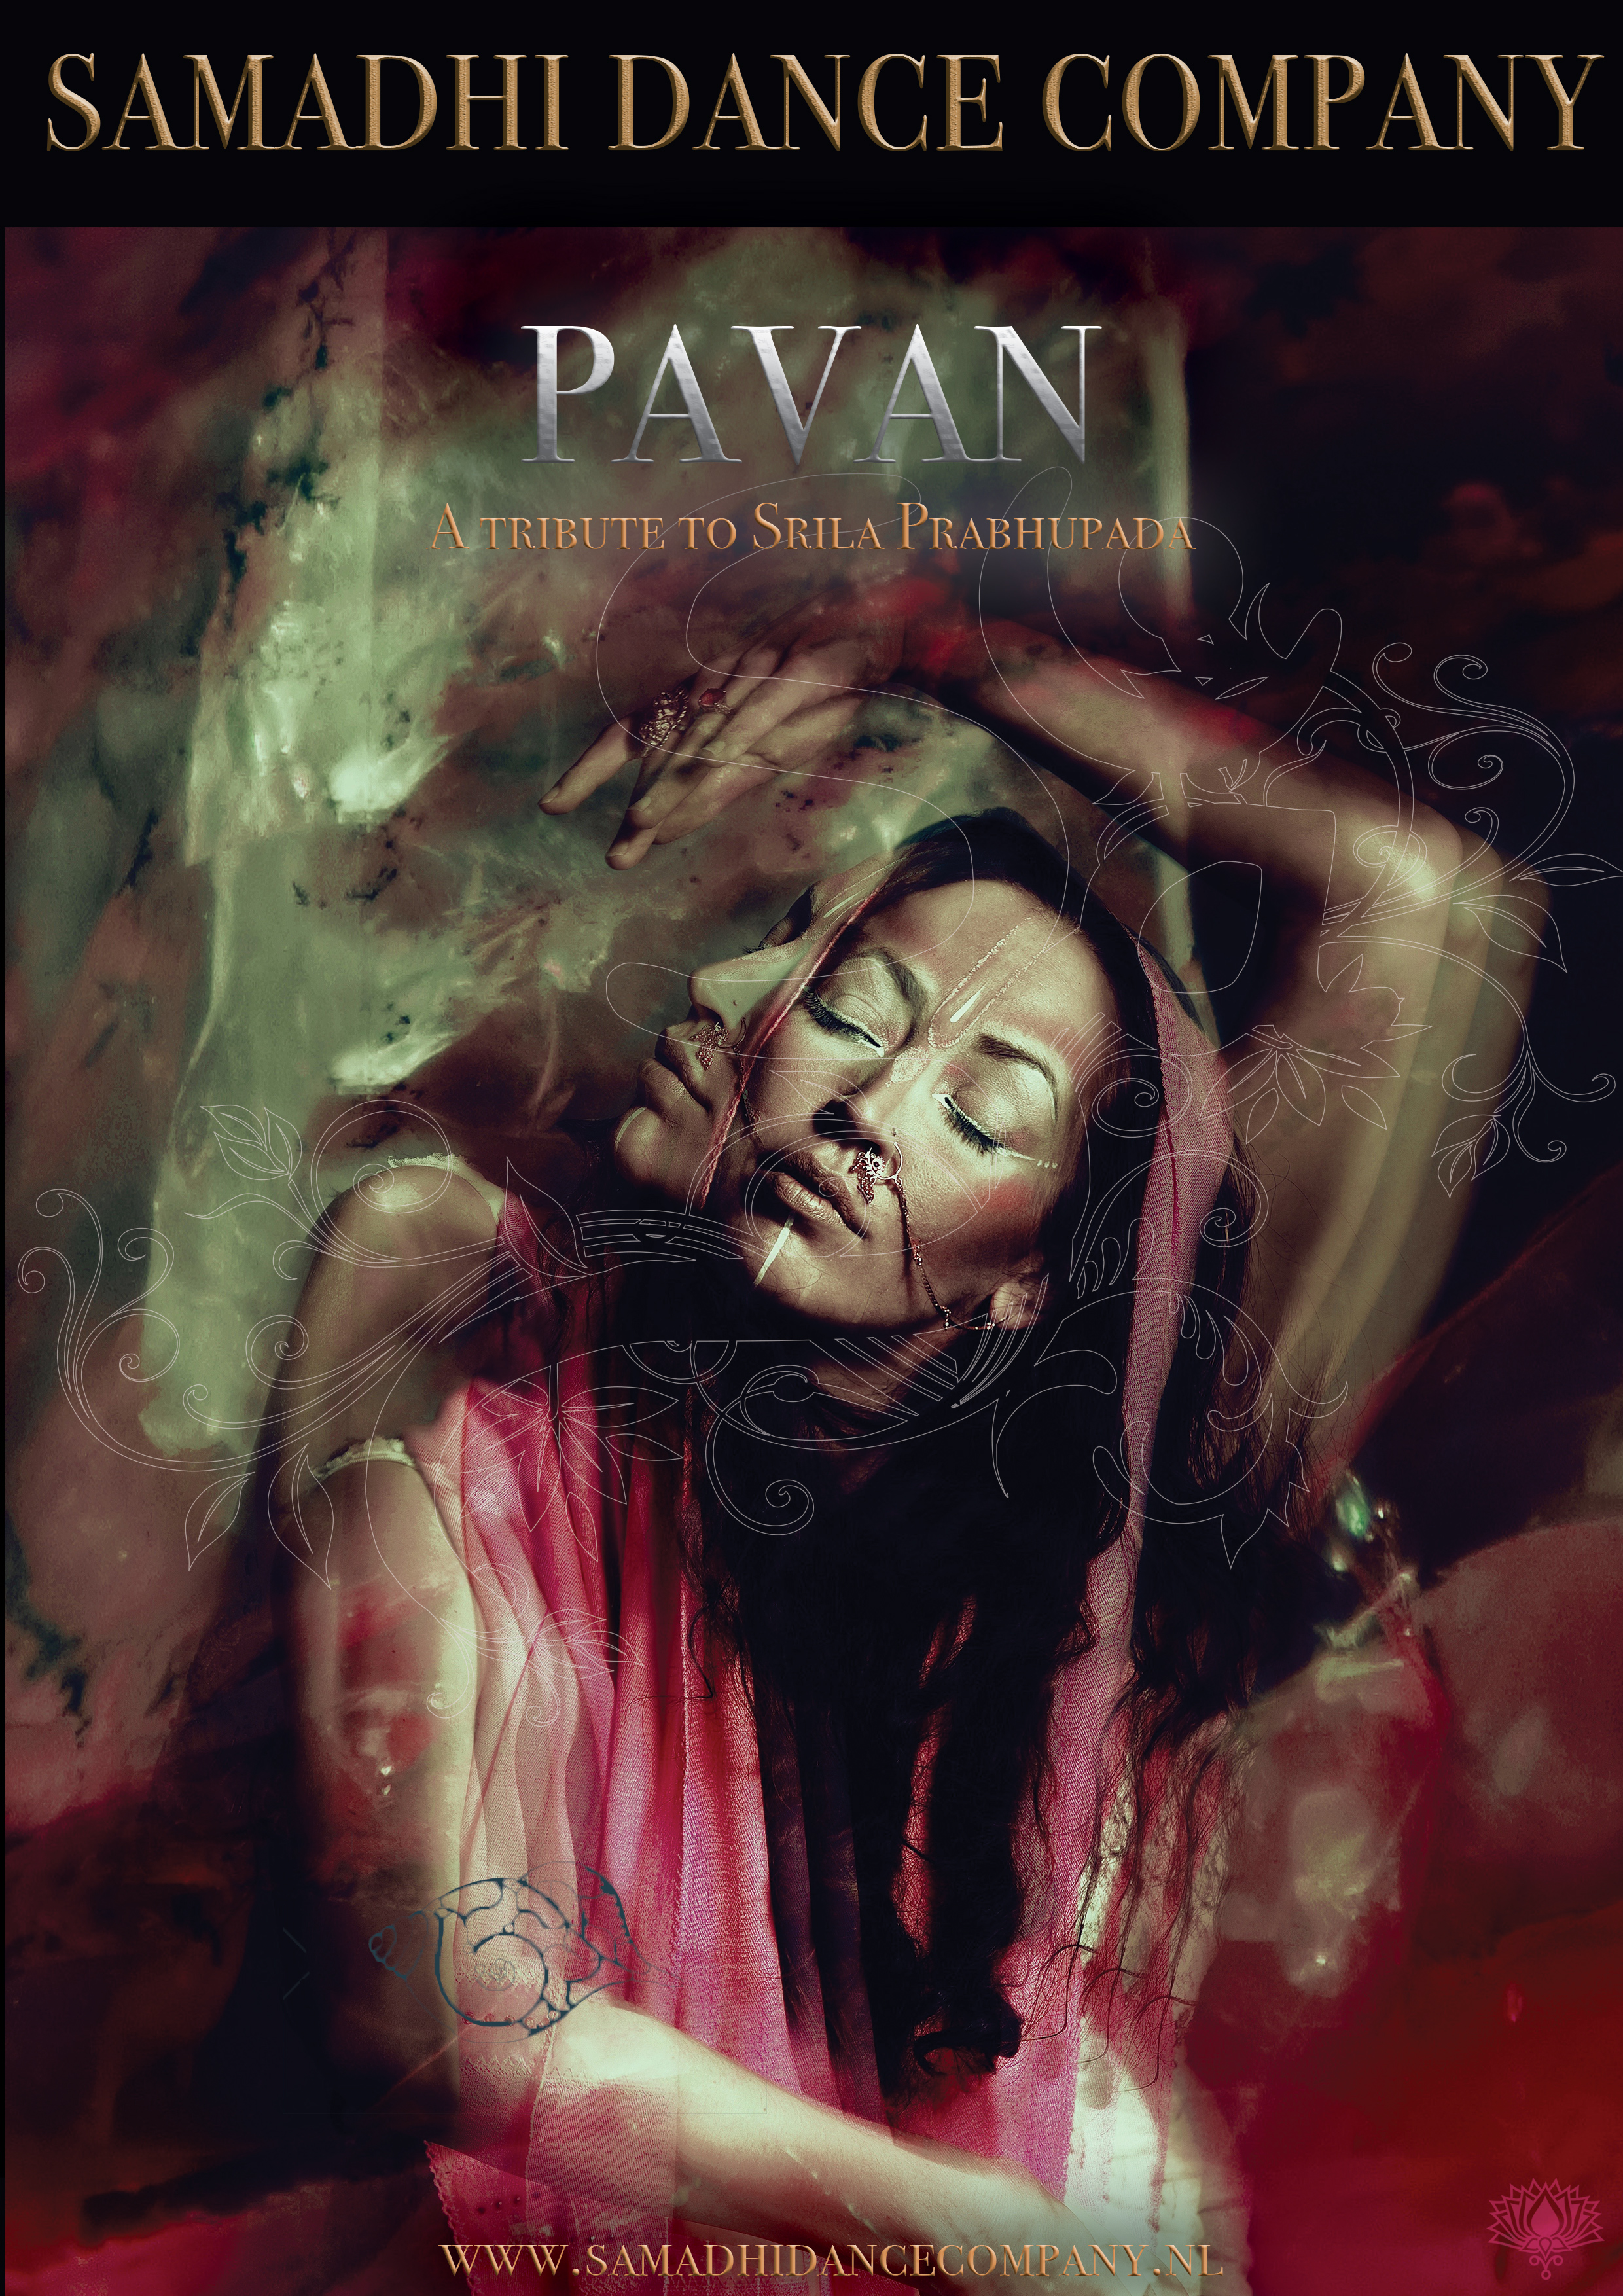 'Japa' from 'Pavan' soundtrack